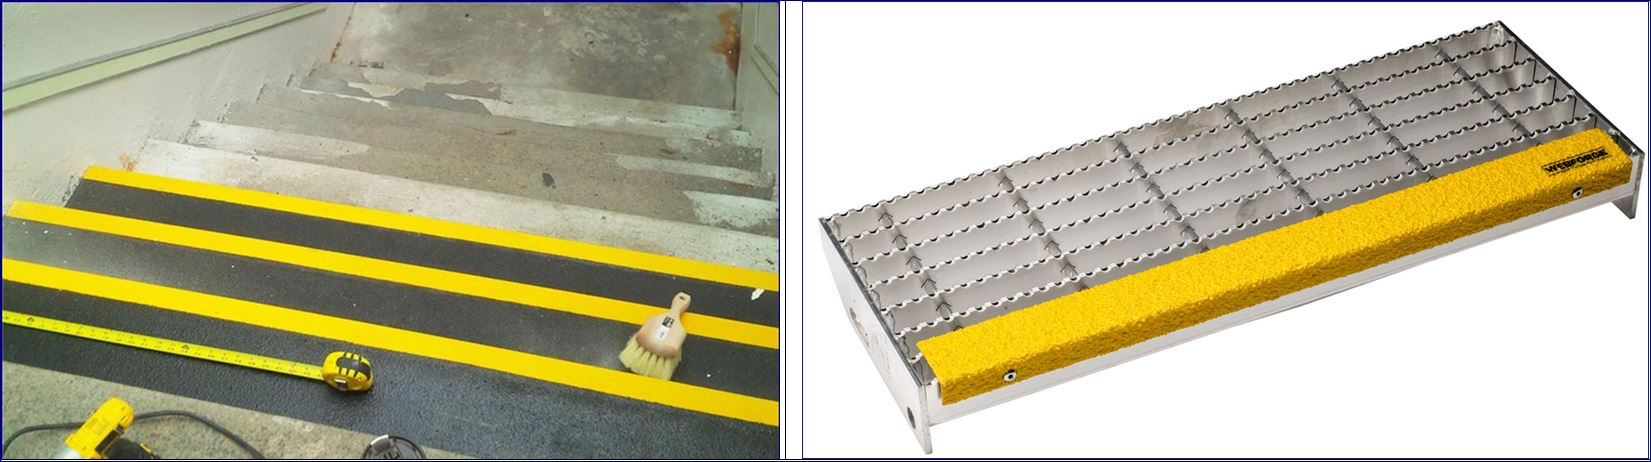 Stair Tread Nosing Step Cover แผ่นเทปตีเส้นเรืองแสงกั้นเขตจมูกขอบมุมคิ้วแผงครอบบันได